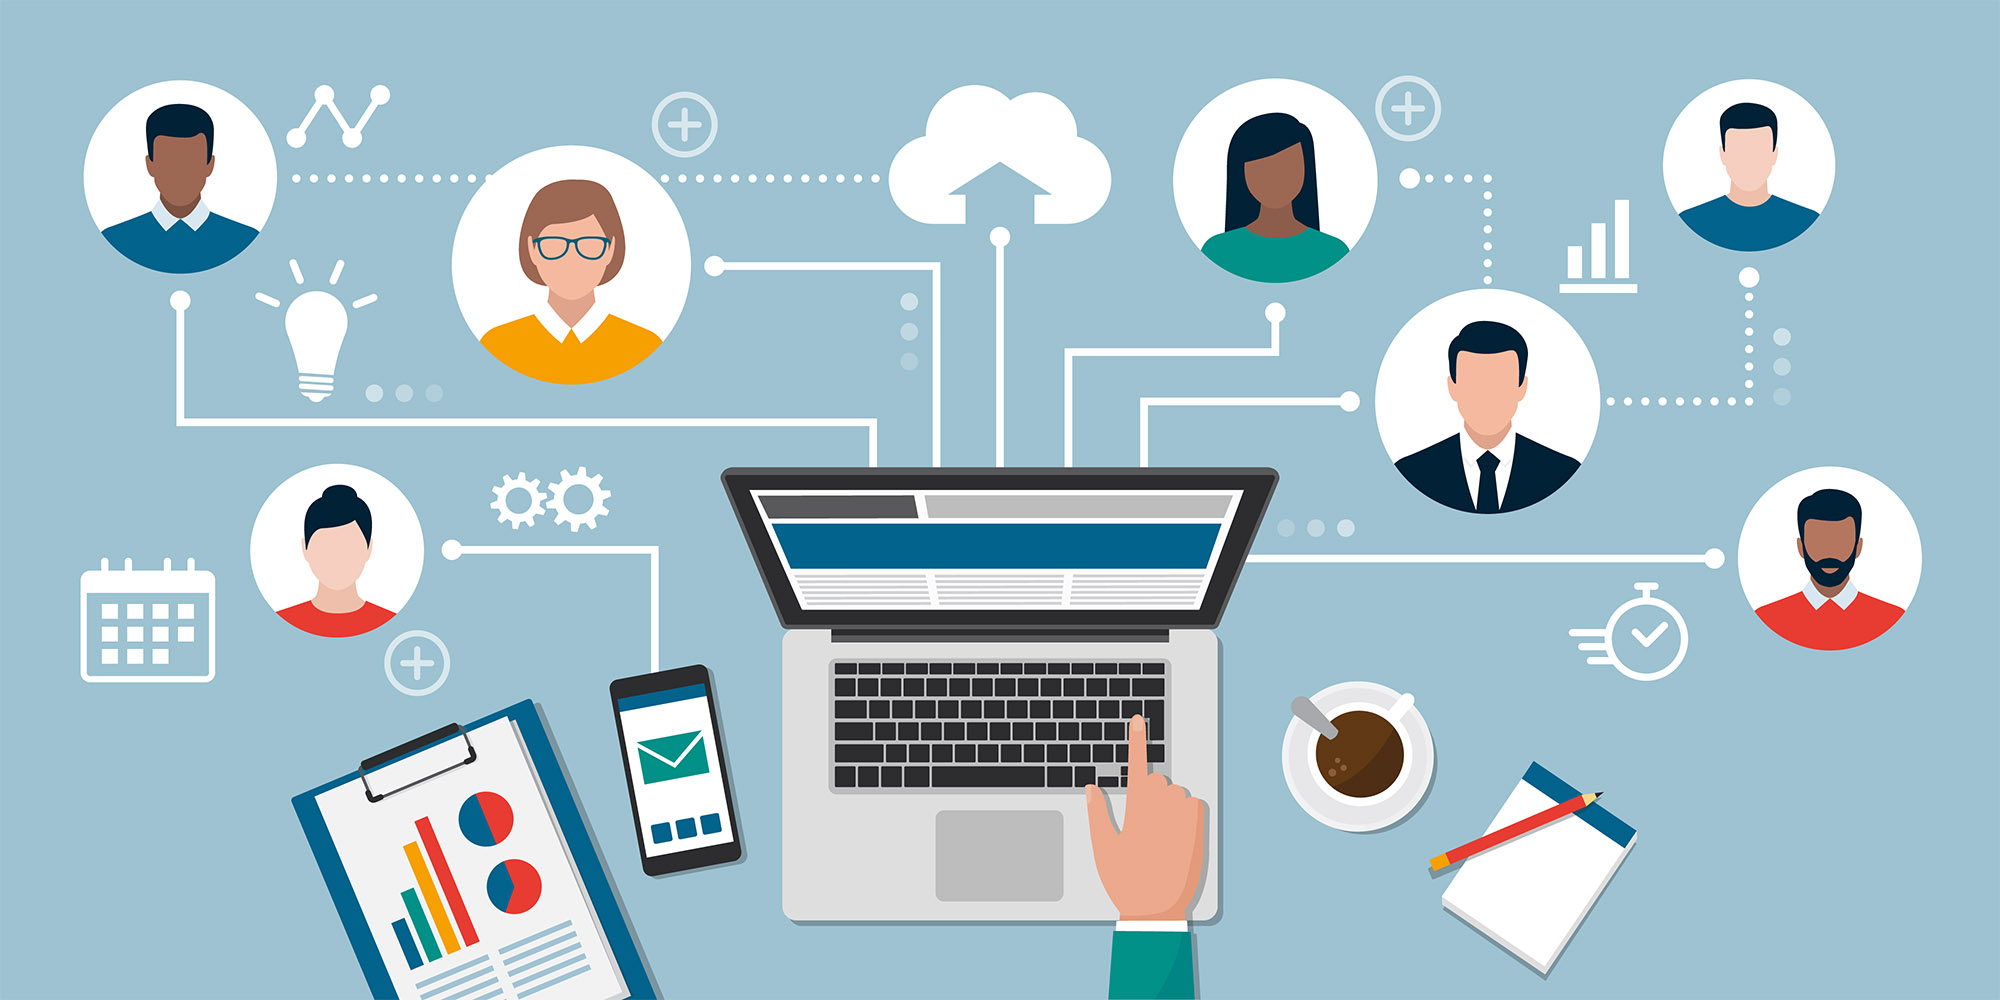 Teleworking and online freelancing